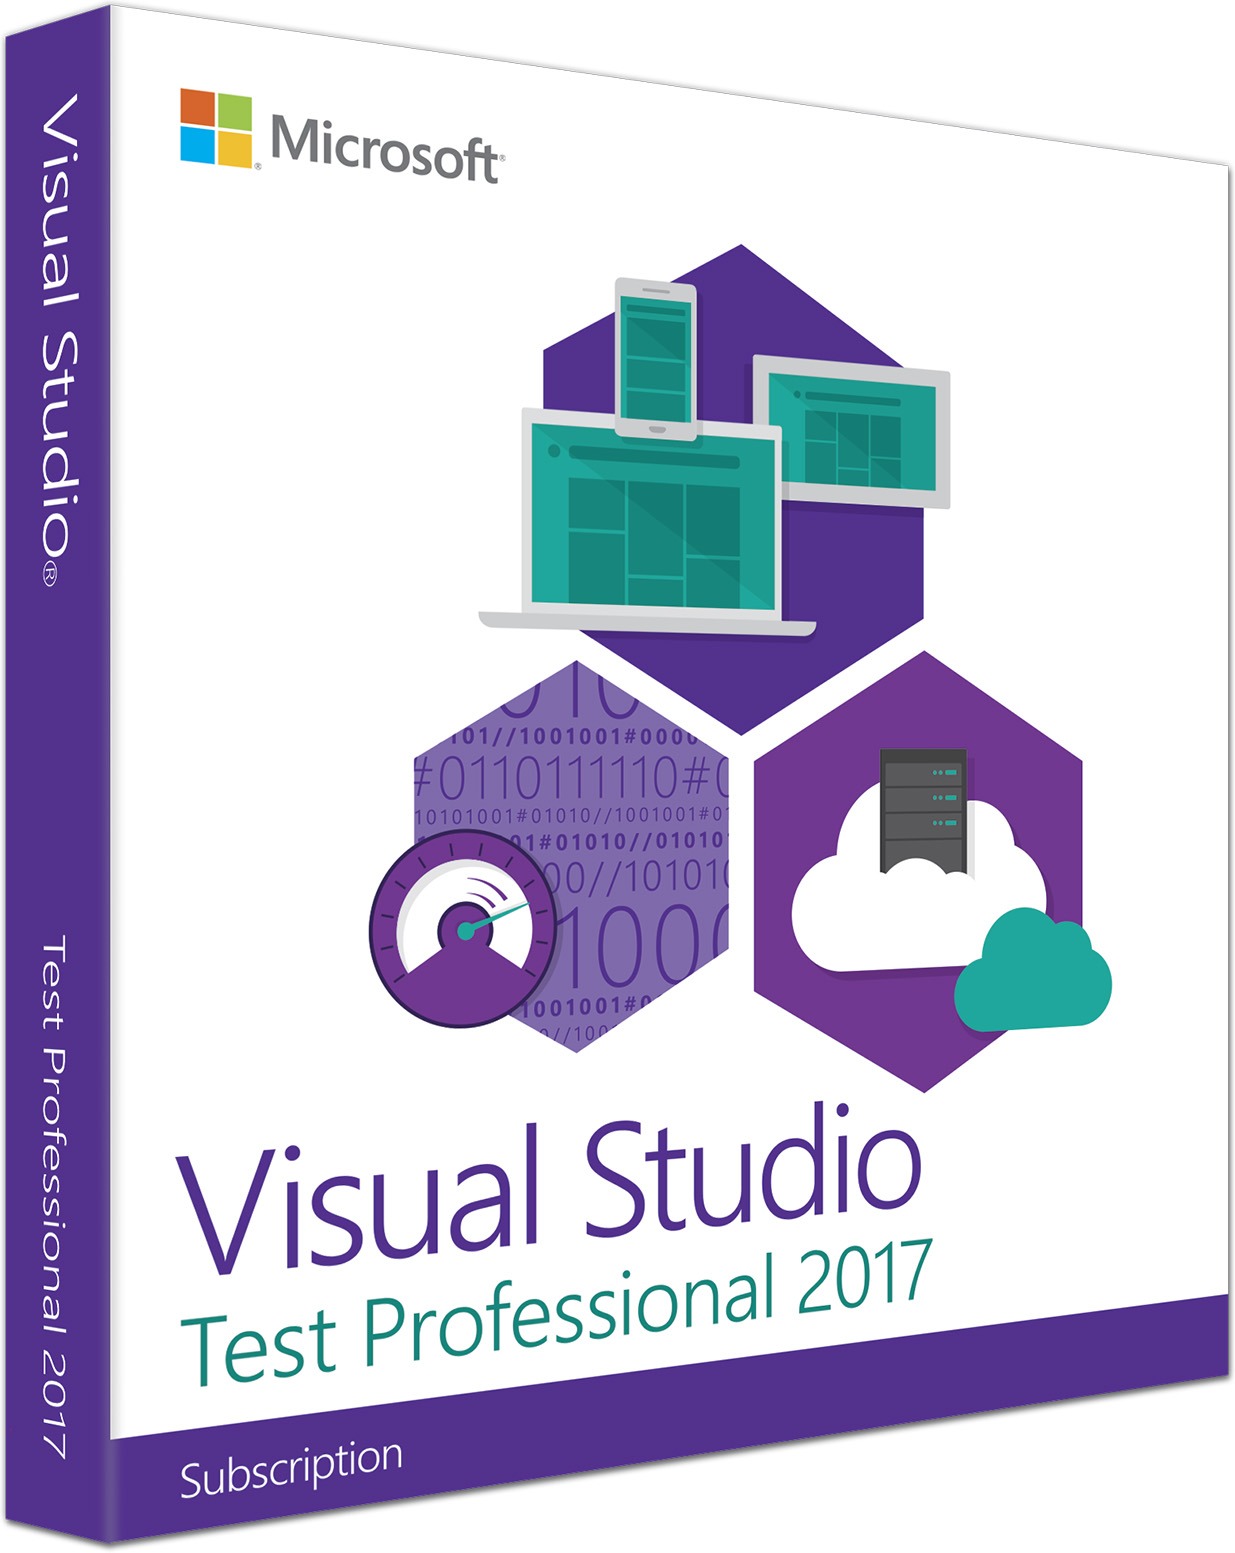 Visual Studio Test Professional Subscription